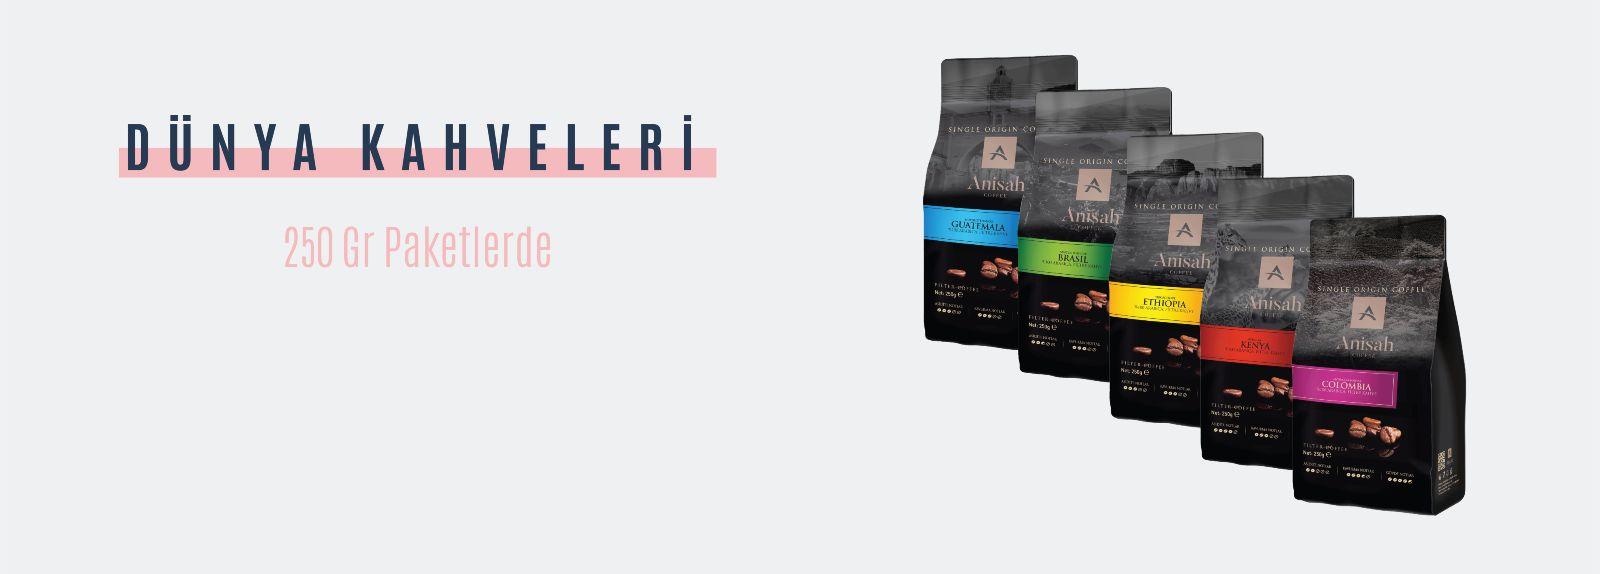 Yöresel Dünya Filtre Kahve Seti